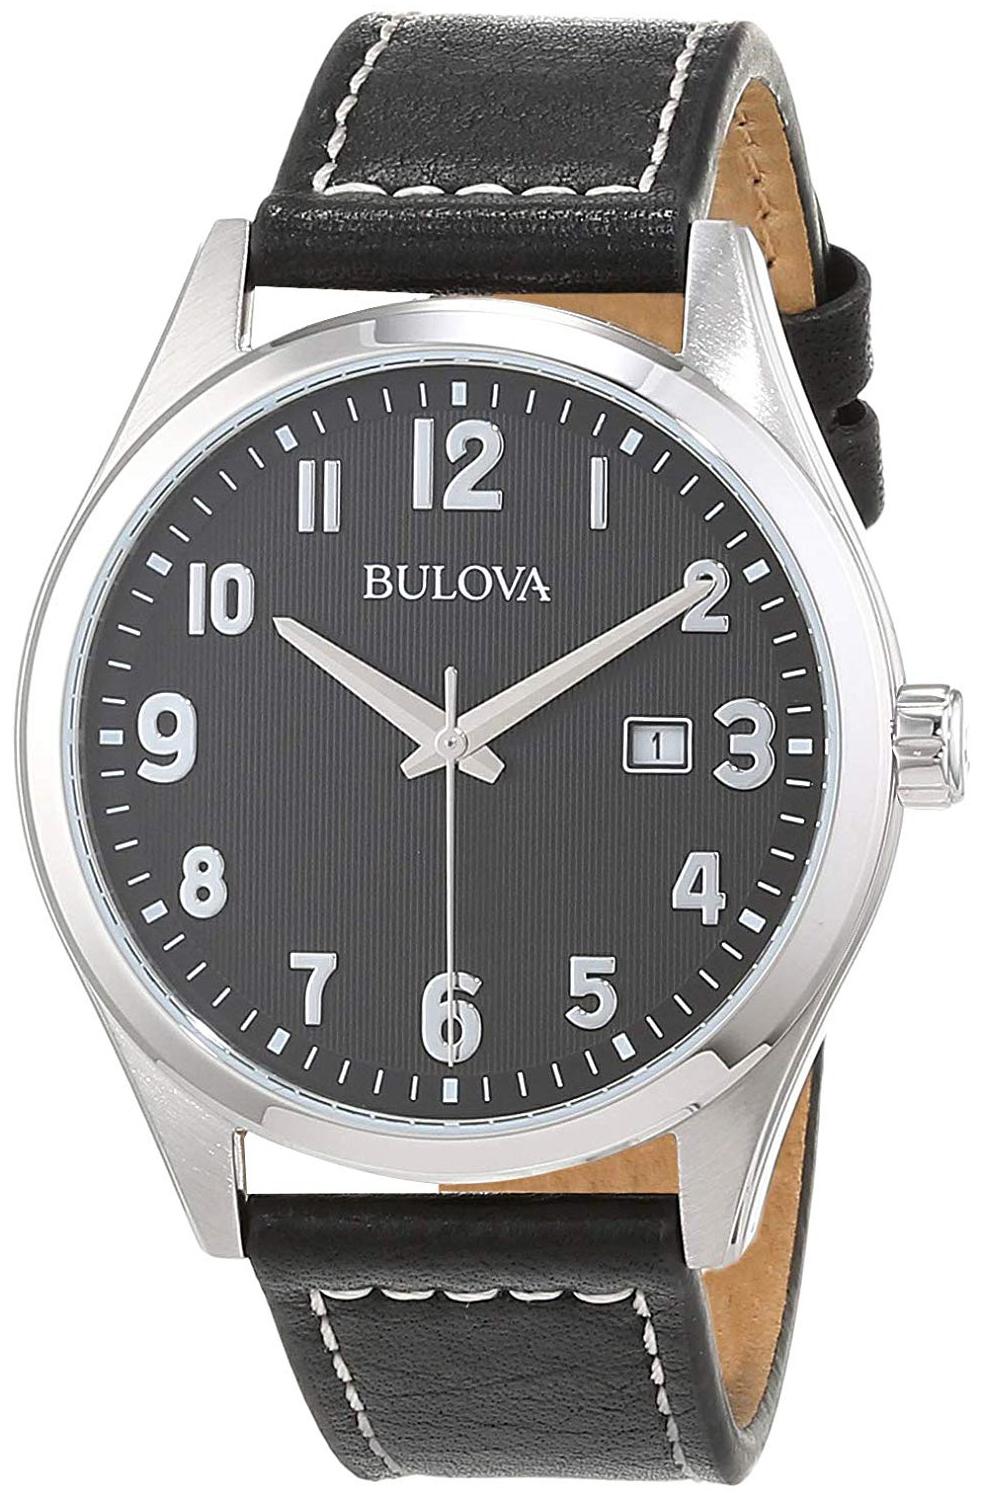 Bulova Classic Herreklokke 96B299 Sort/Lær Ø41 mm - Bulova